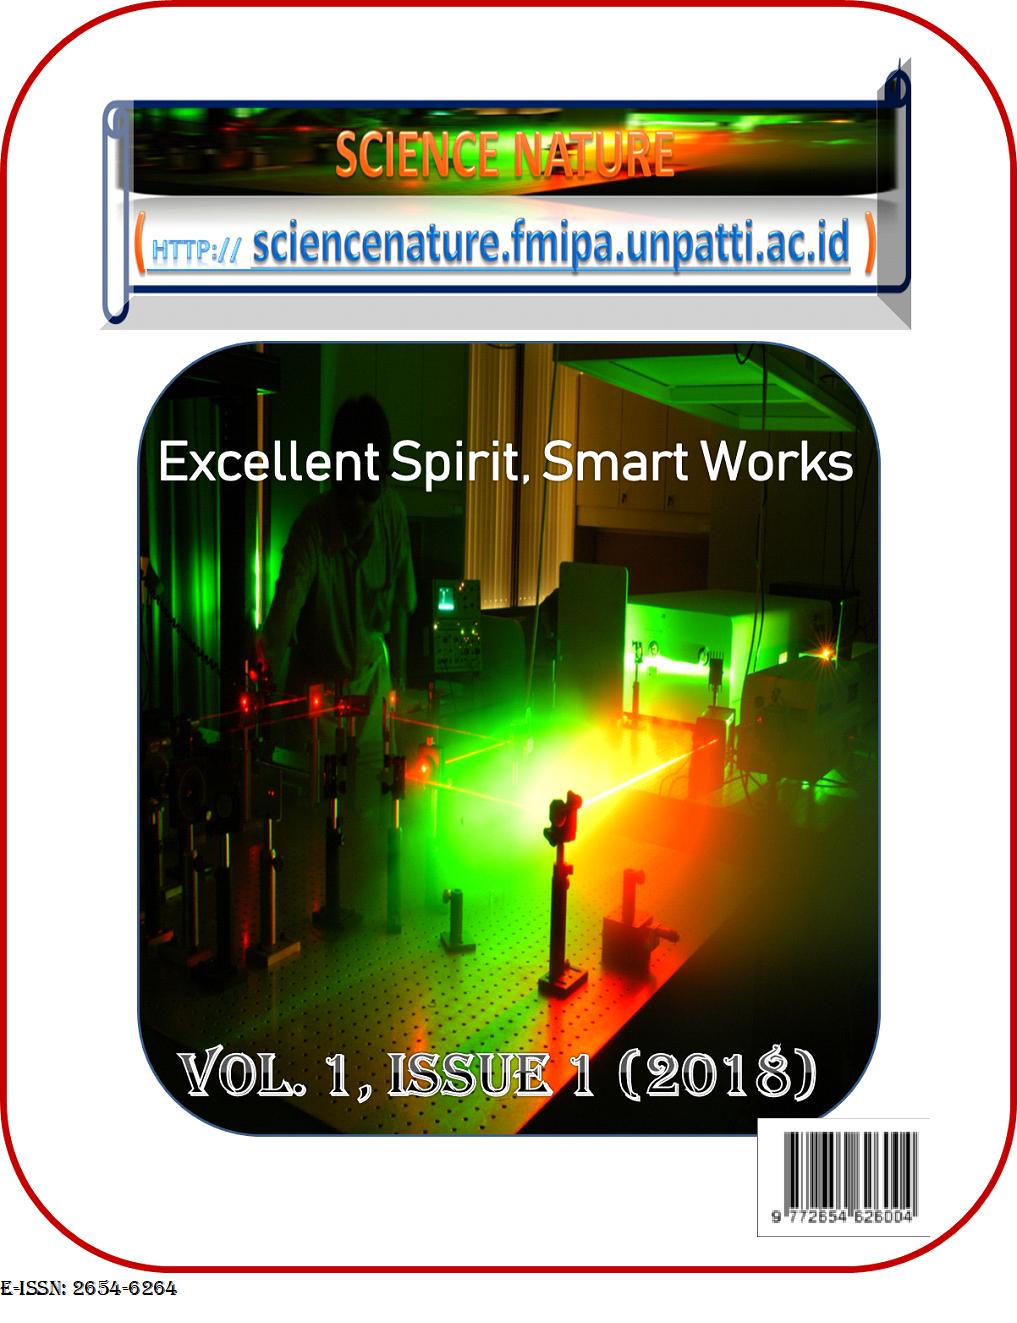 Excellent Spirit, Smart Works